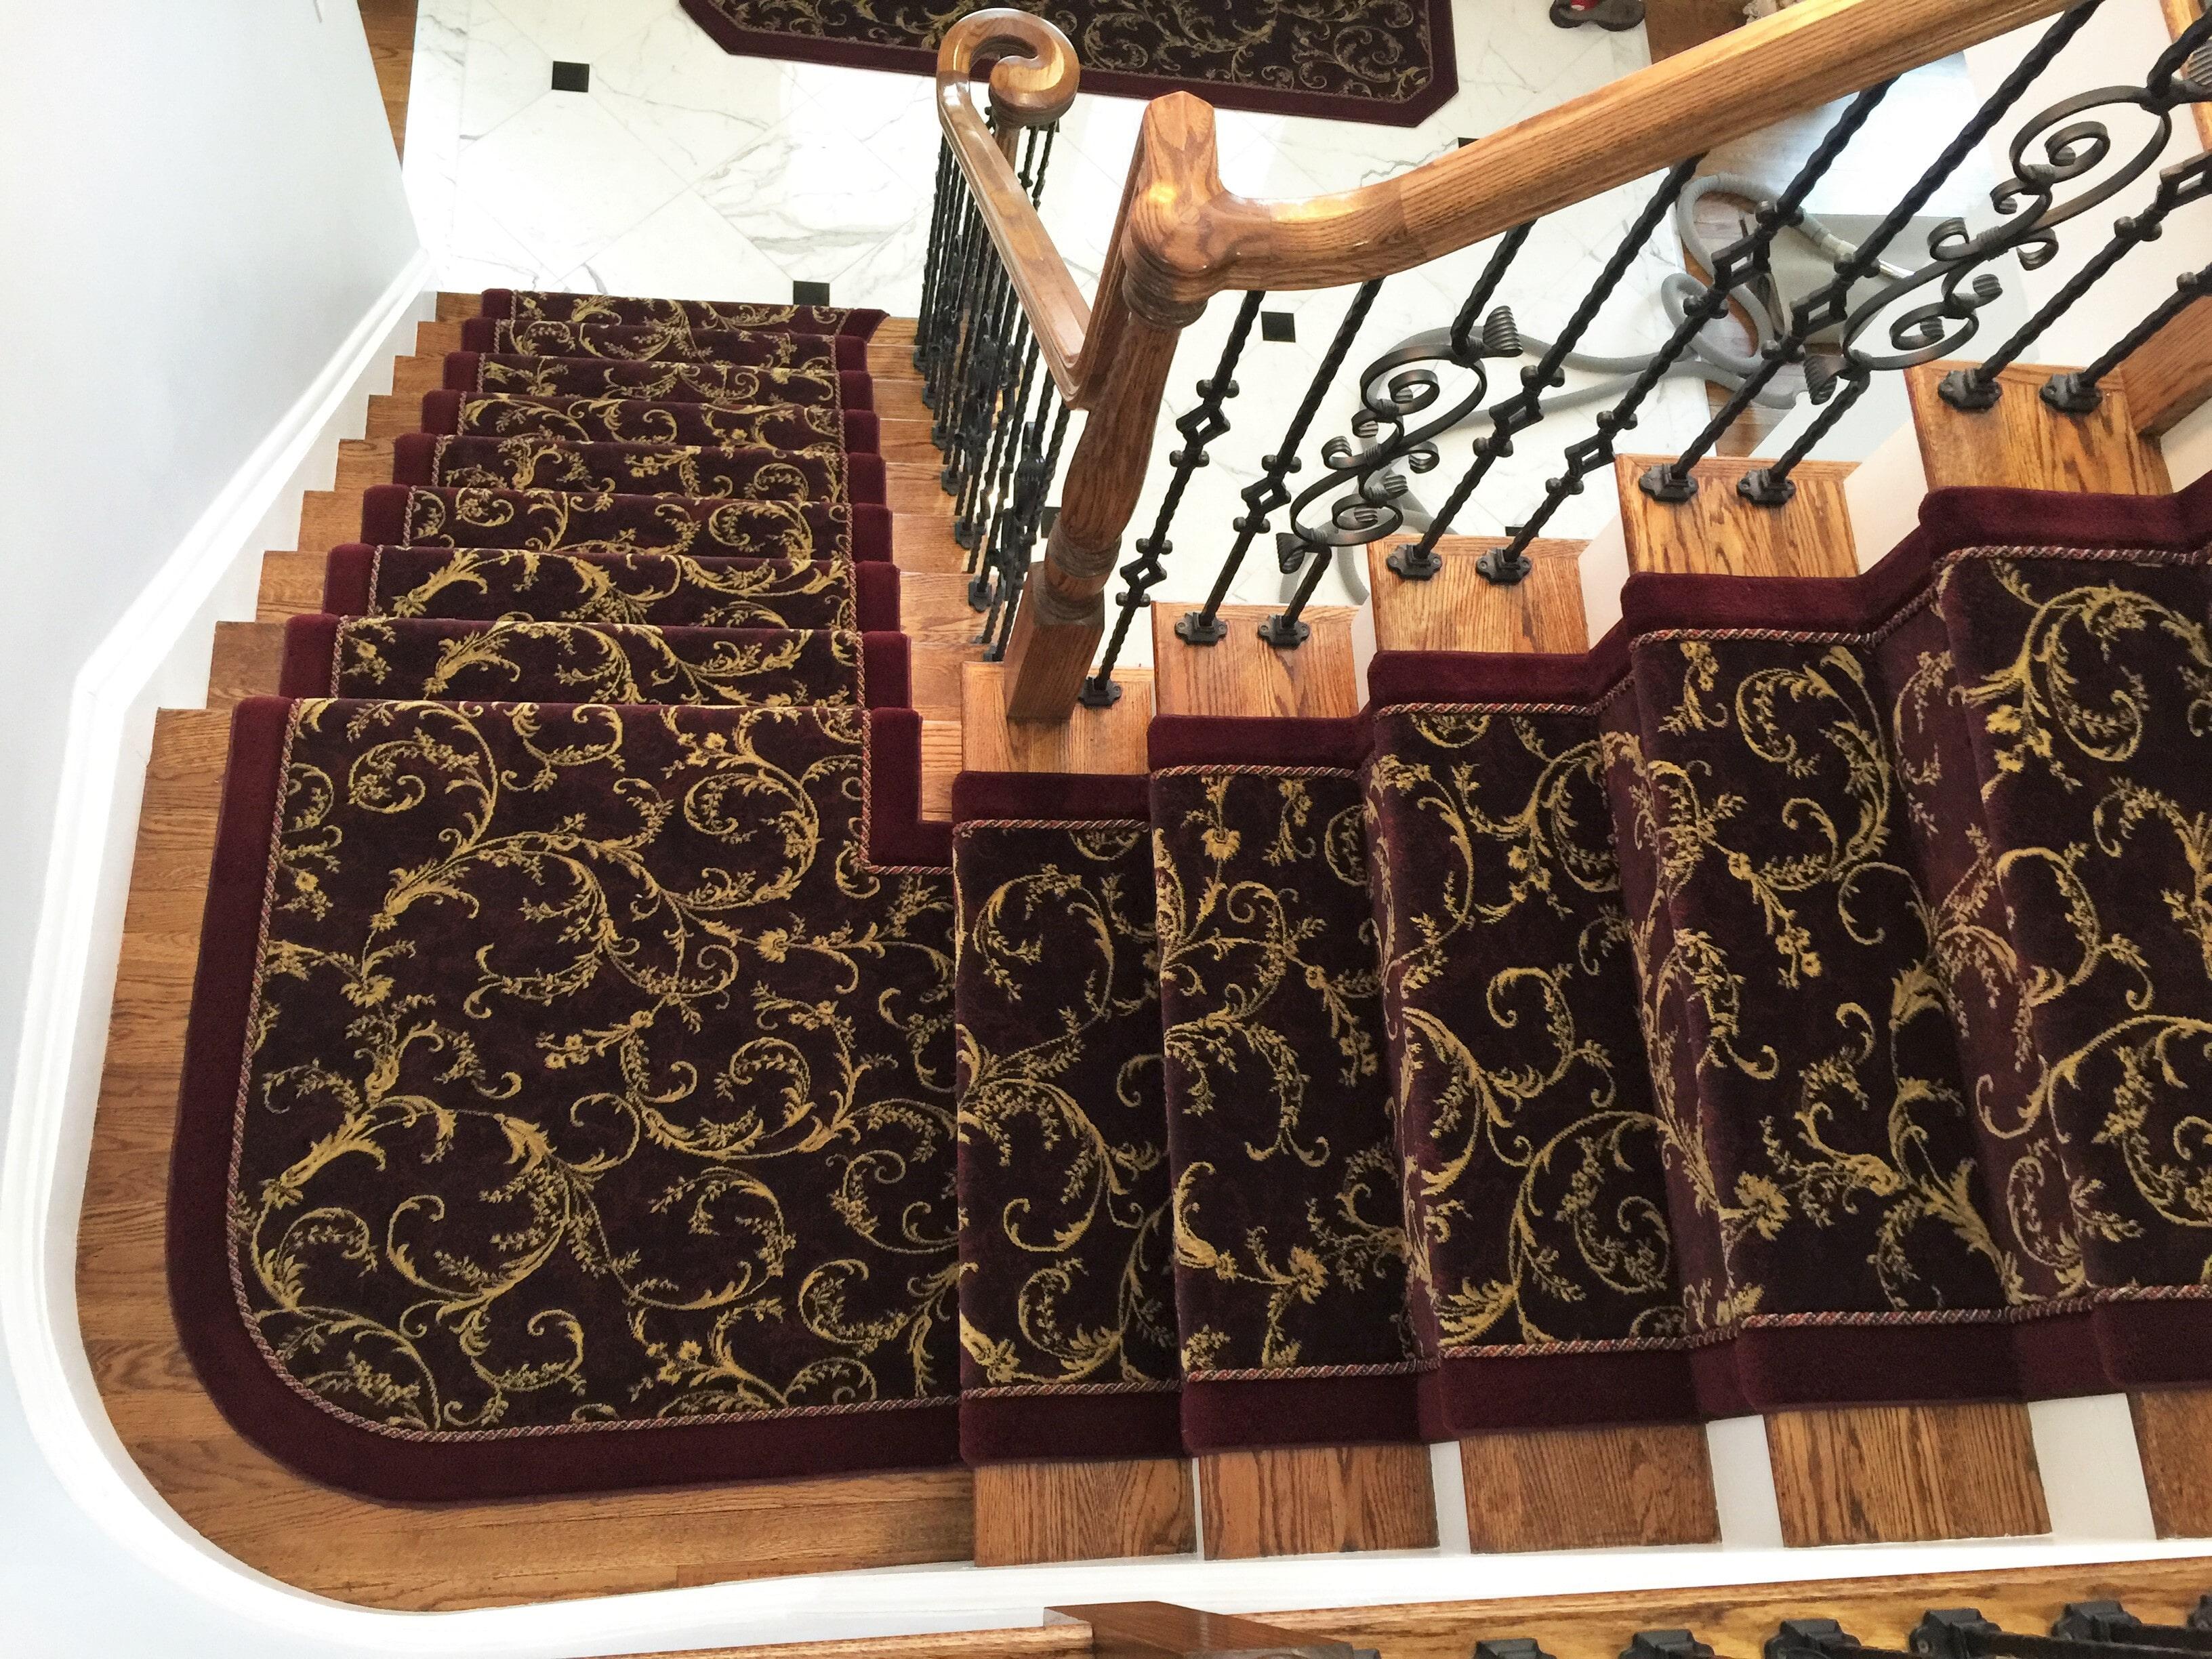 Custom Hallway & Stair Runners in Franklin Lake, NJ from G. Fried Flooring & Design